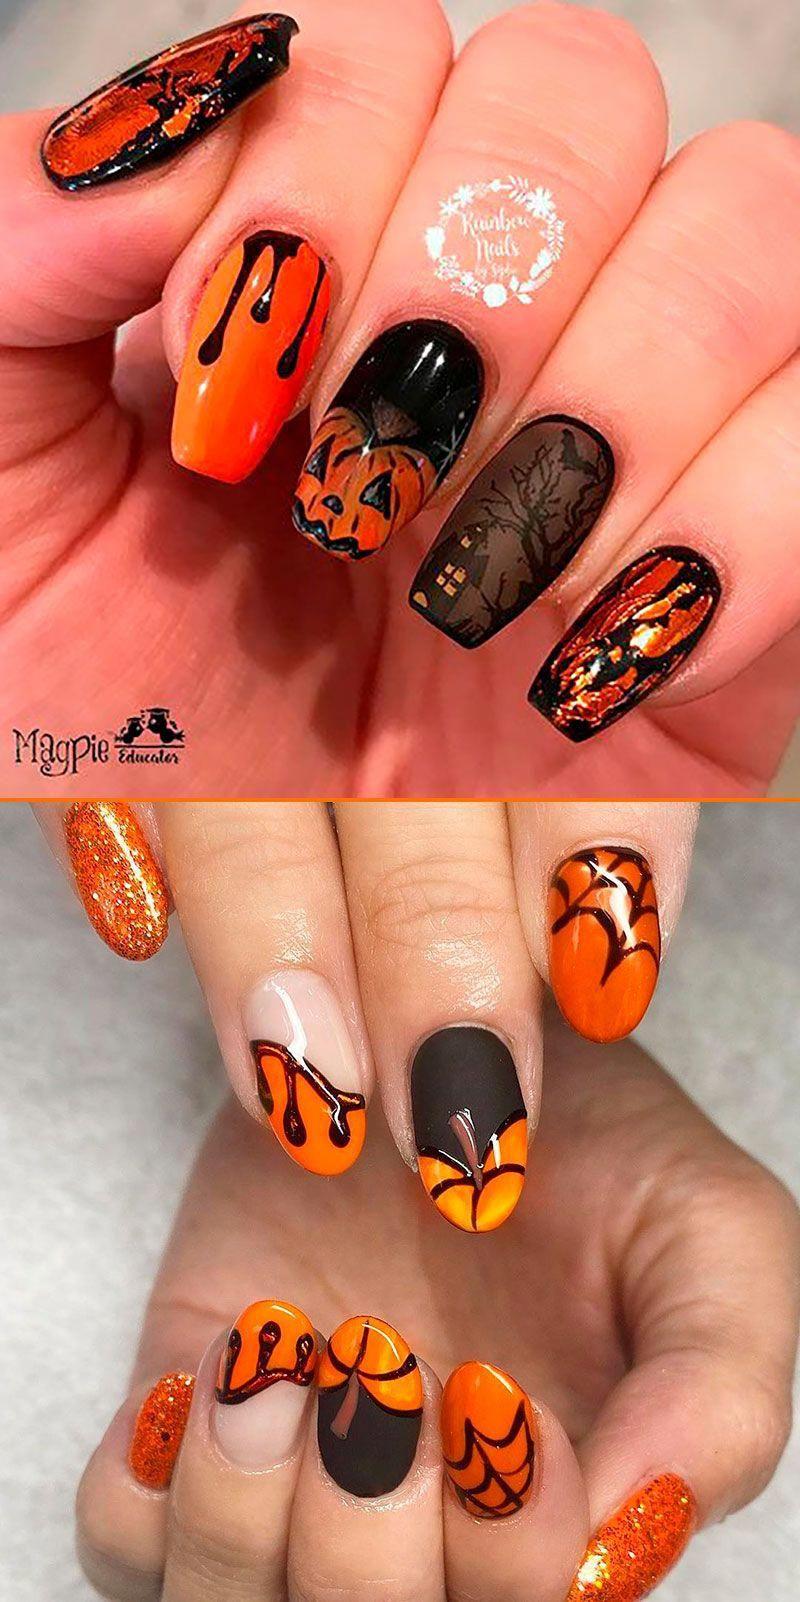 Pin by Jordan on Nails in 2020 | Pumpkin nails, Halloween ...